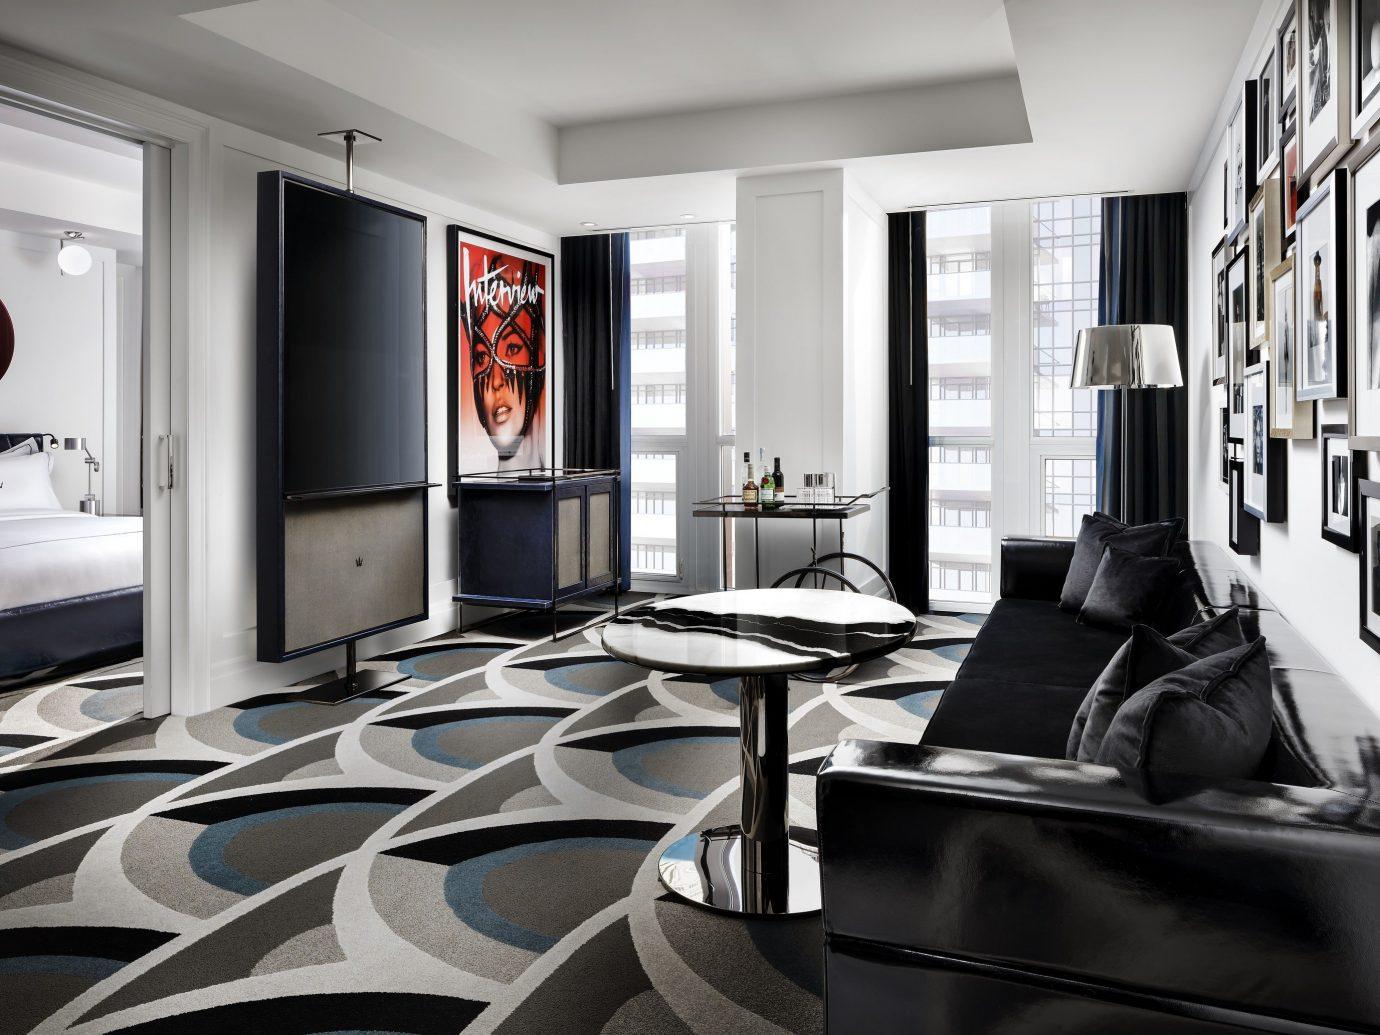 Canada Hotels Toronto indoor wall window ceiling room interior design Living living room floor furniture product design flooring interior designer angle computer Modern